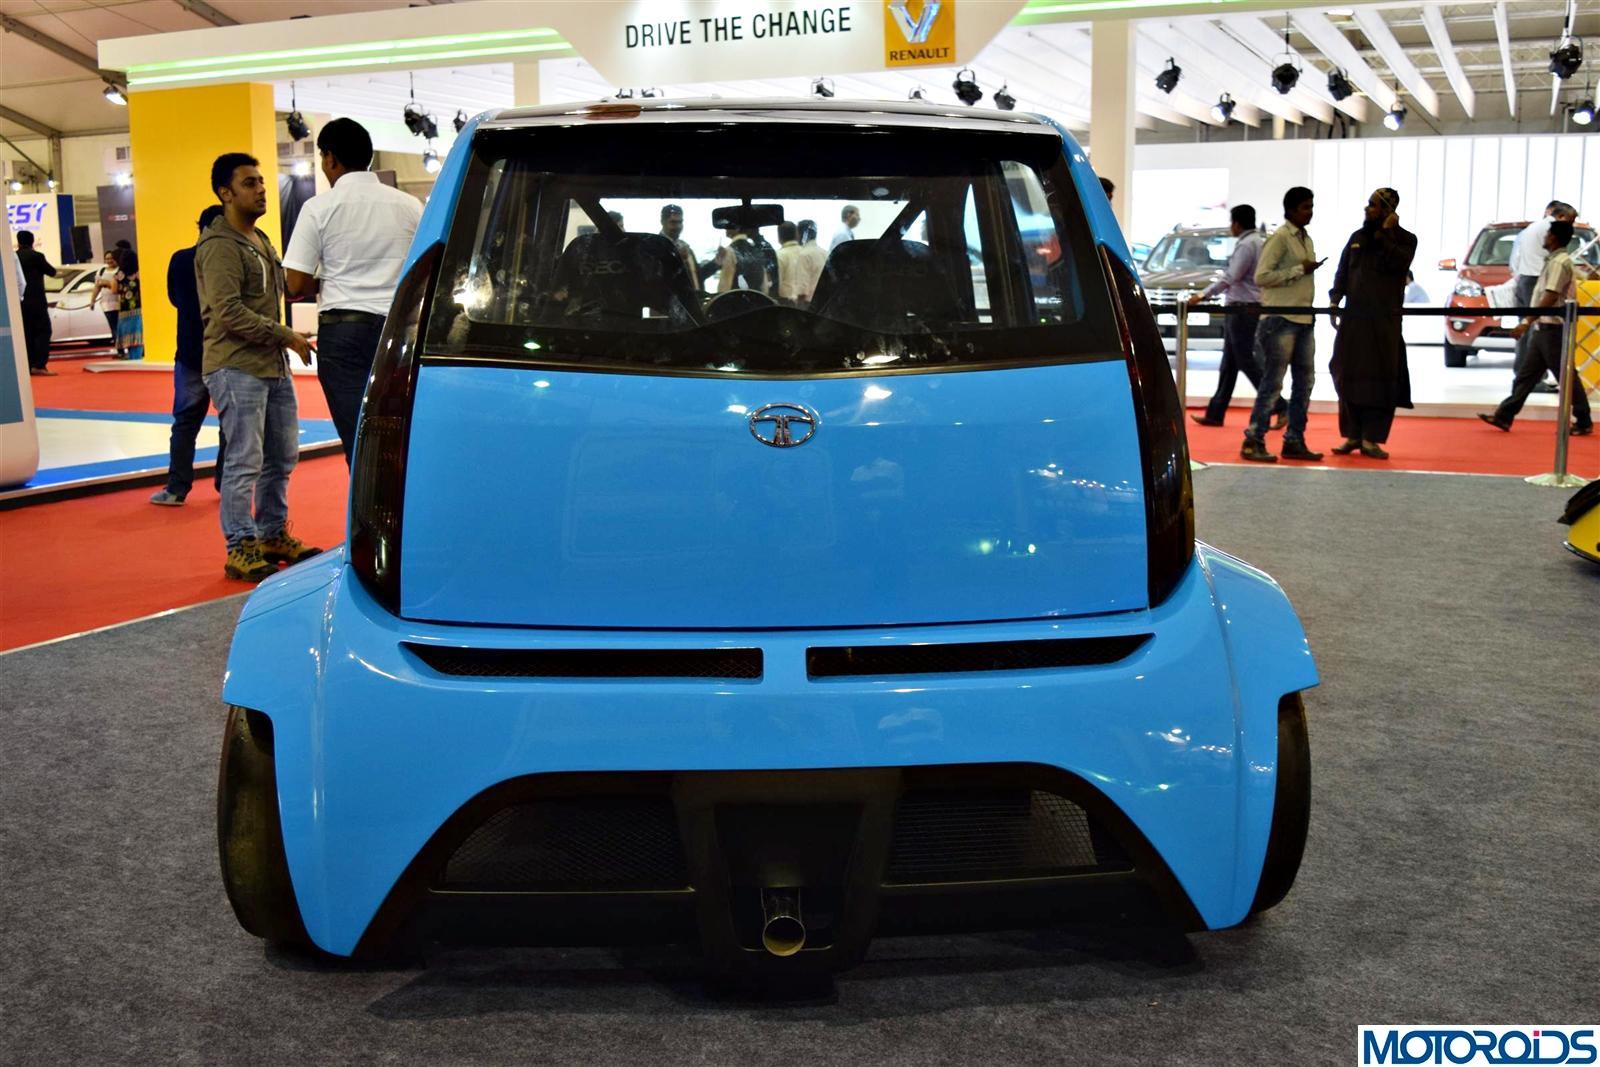 Tata nano engine modification 2018 dodge reviews for Internship for mechanical engineering students in tata motors